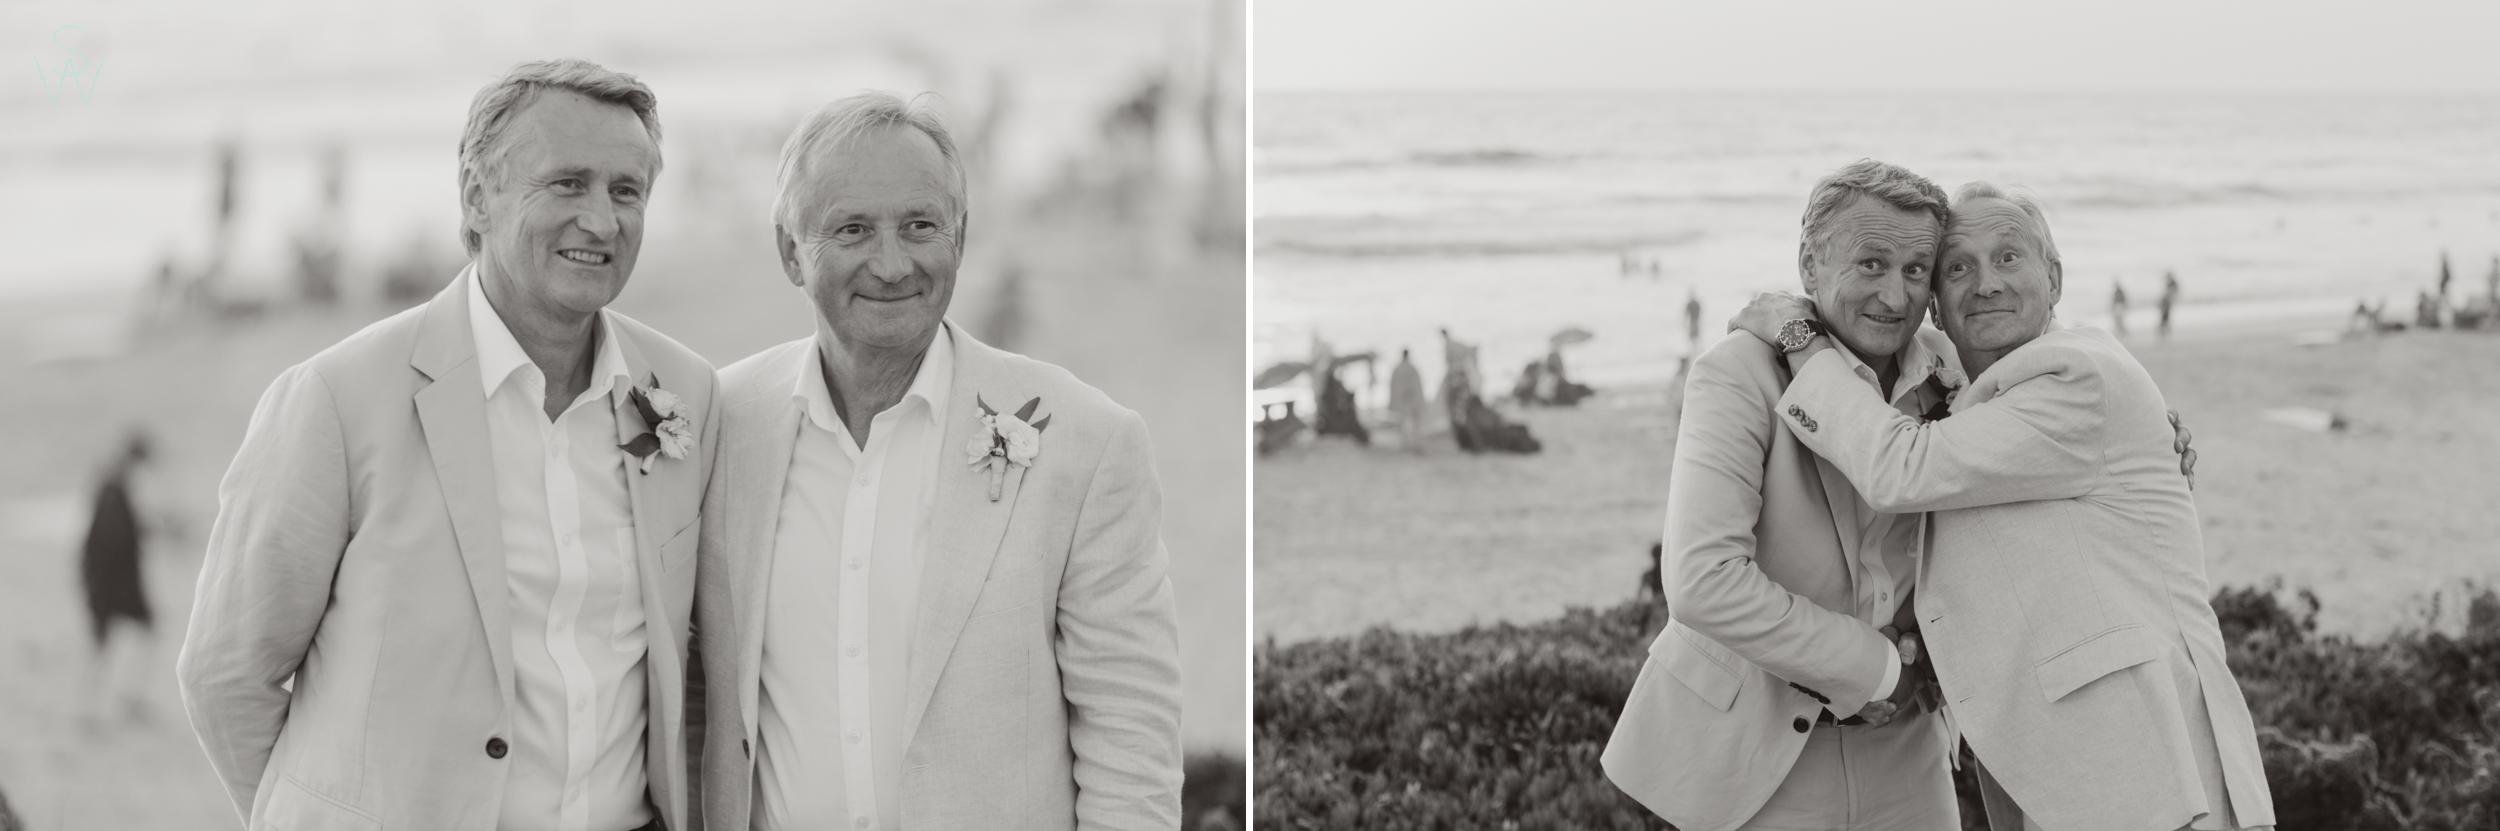 159DEL.MAR.WEDDINGS.photography.shewanders.JPG